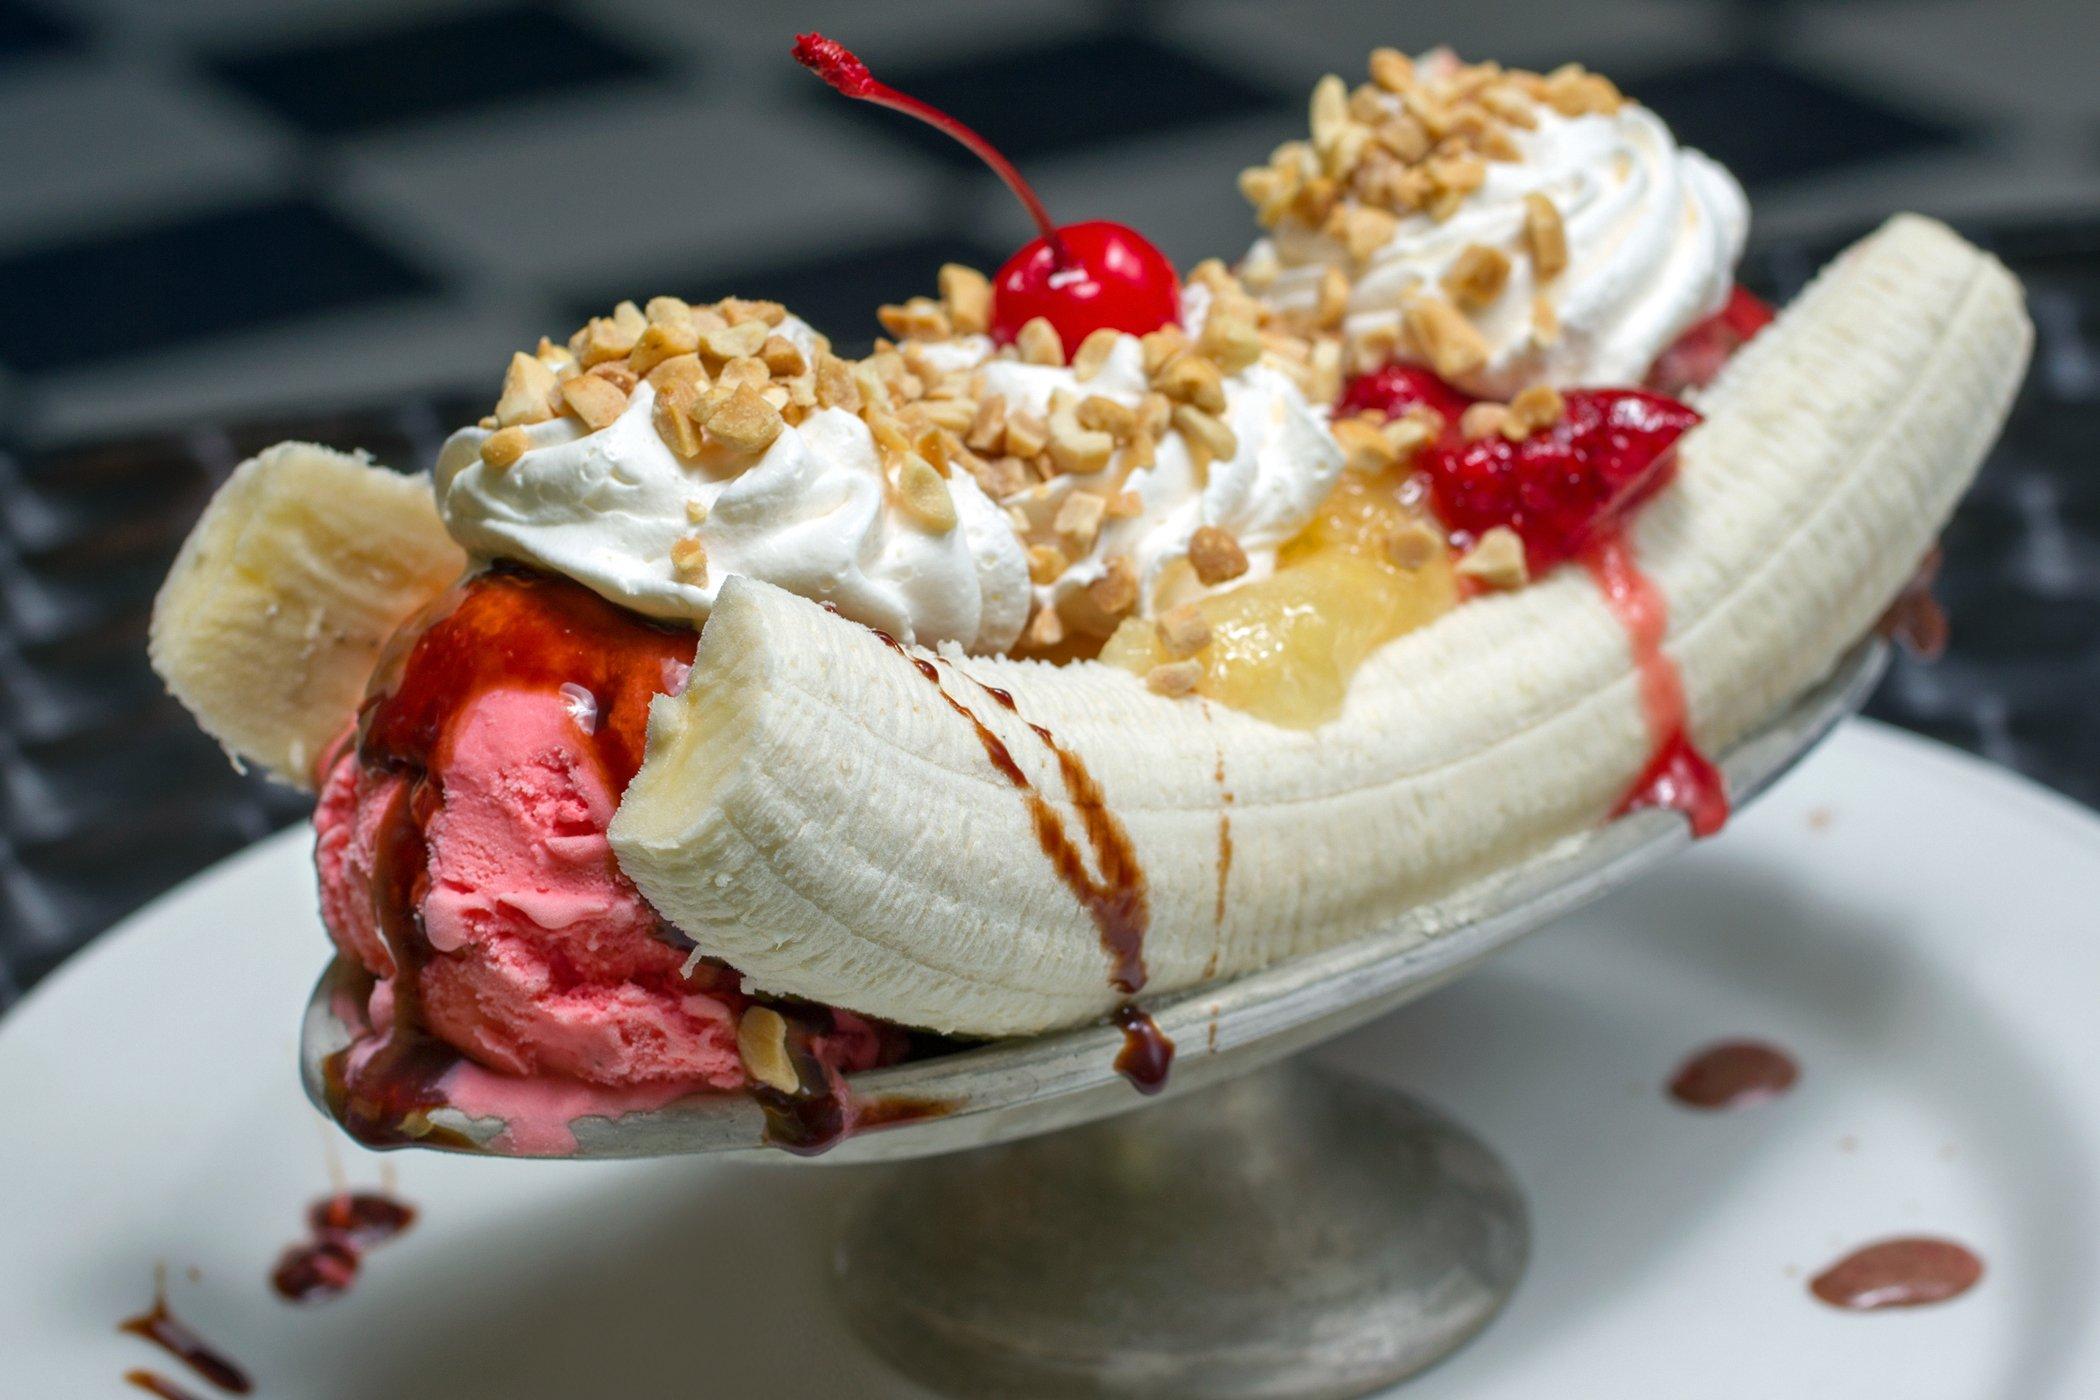 banana split ice cream dessert sweets sugar 1bananasplit wallpaper 2100x1400